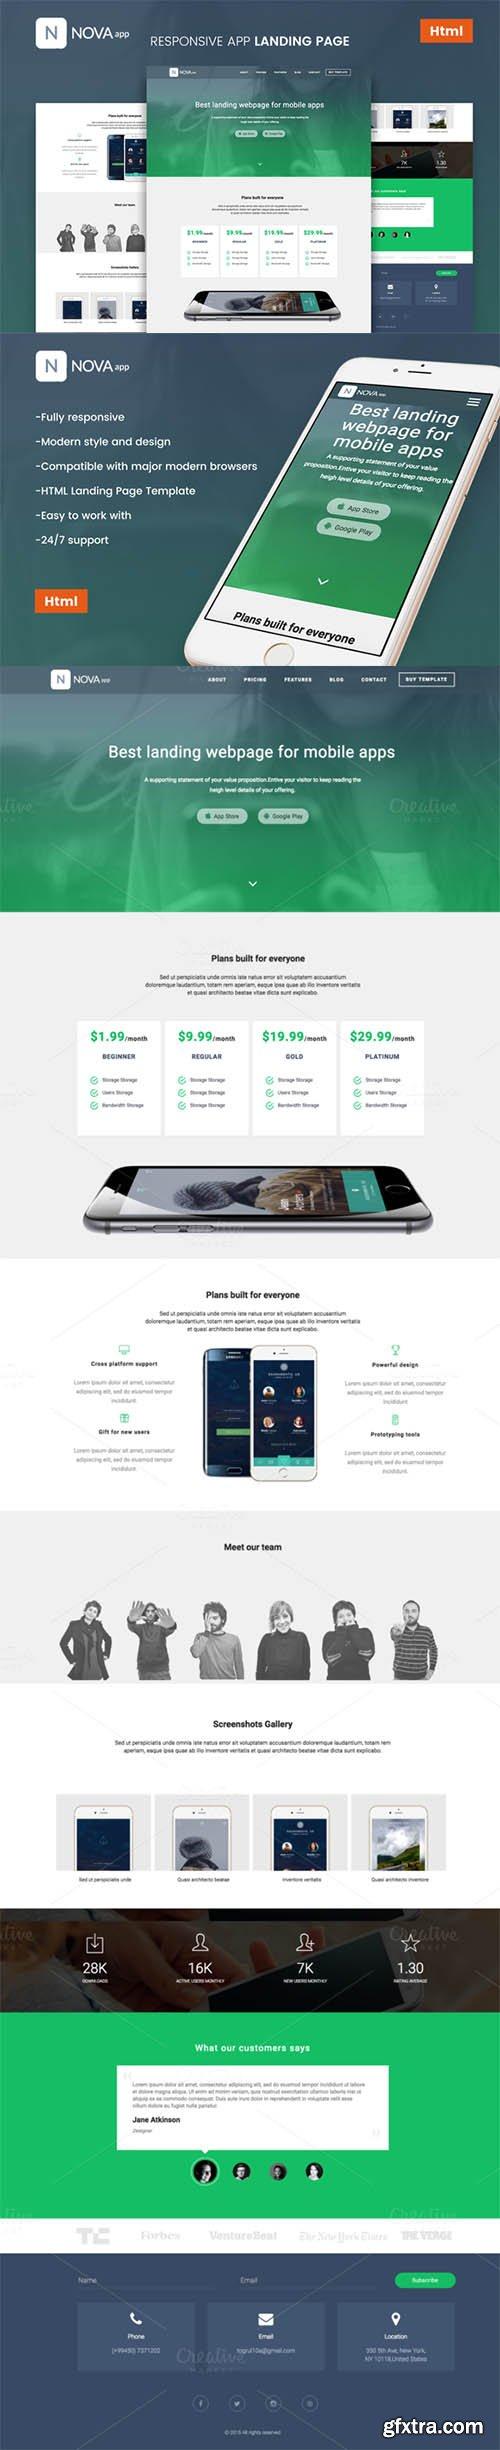 Nova - Responsive App Landing Page - CM 713112